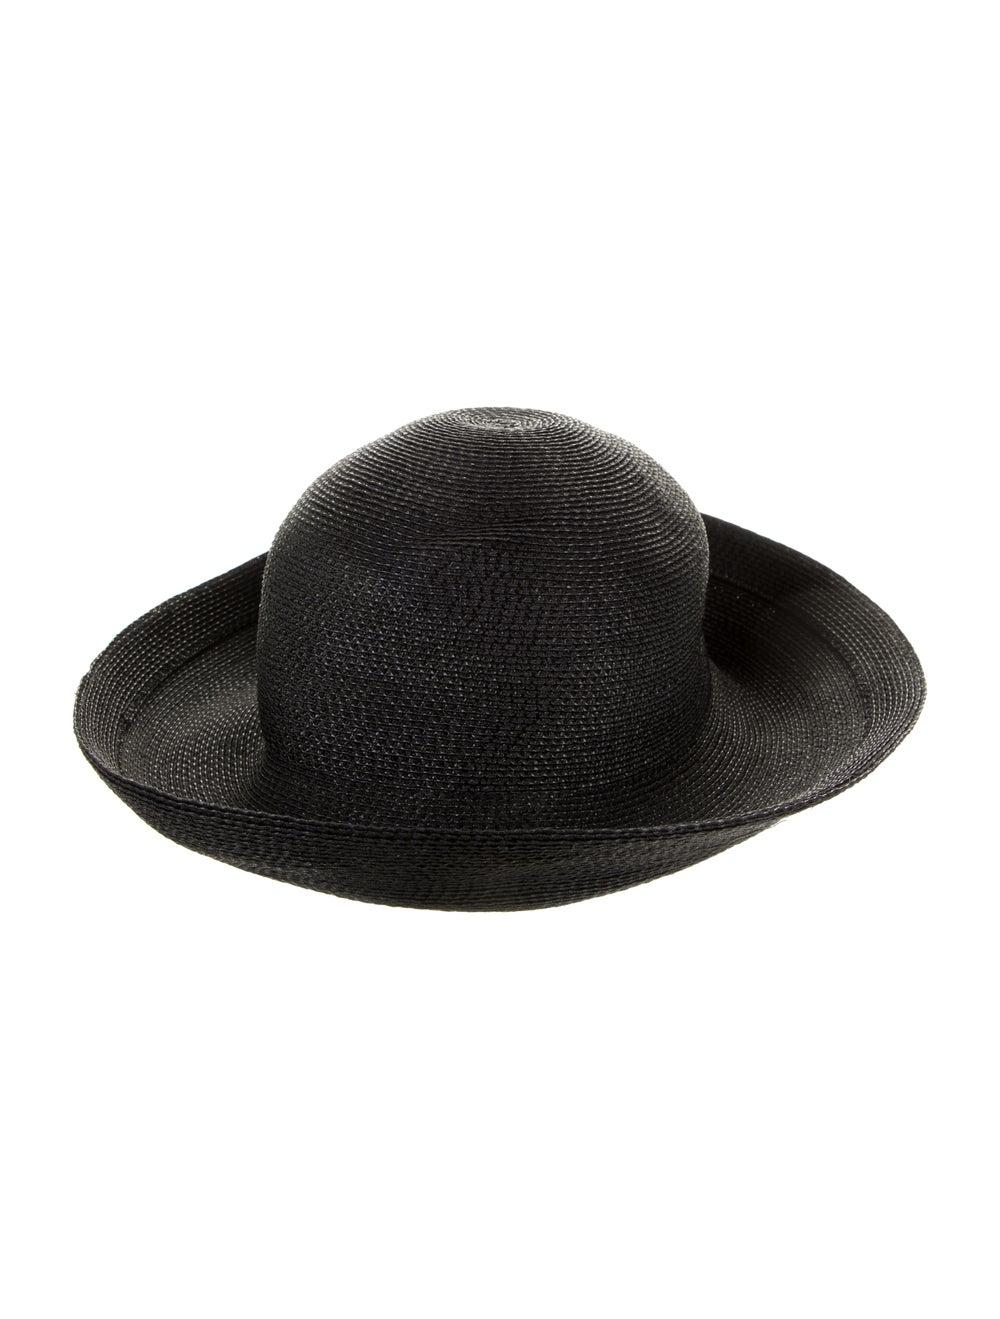 Patricia Underwood Black Straw Sun Hat Black - image 2